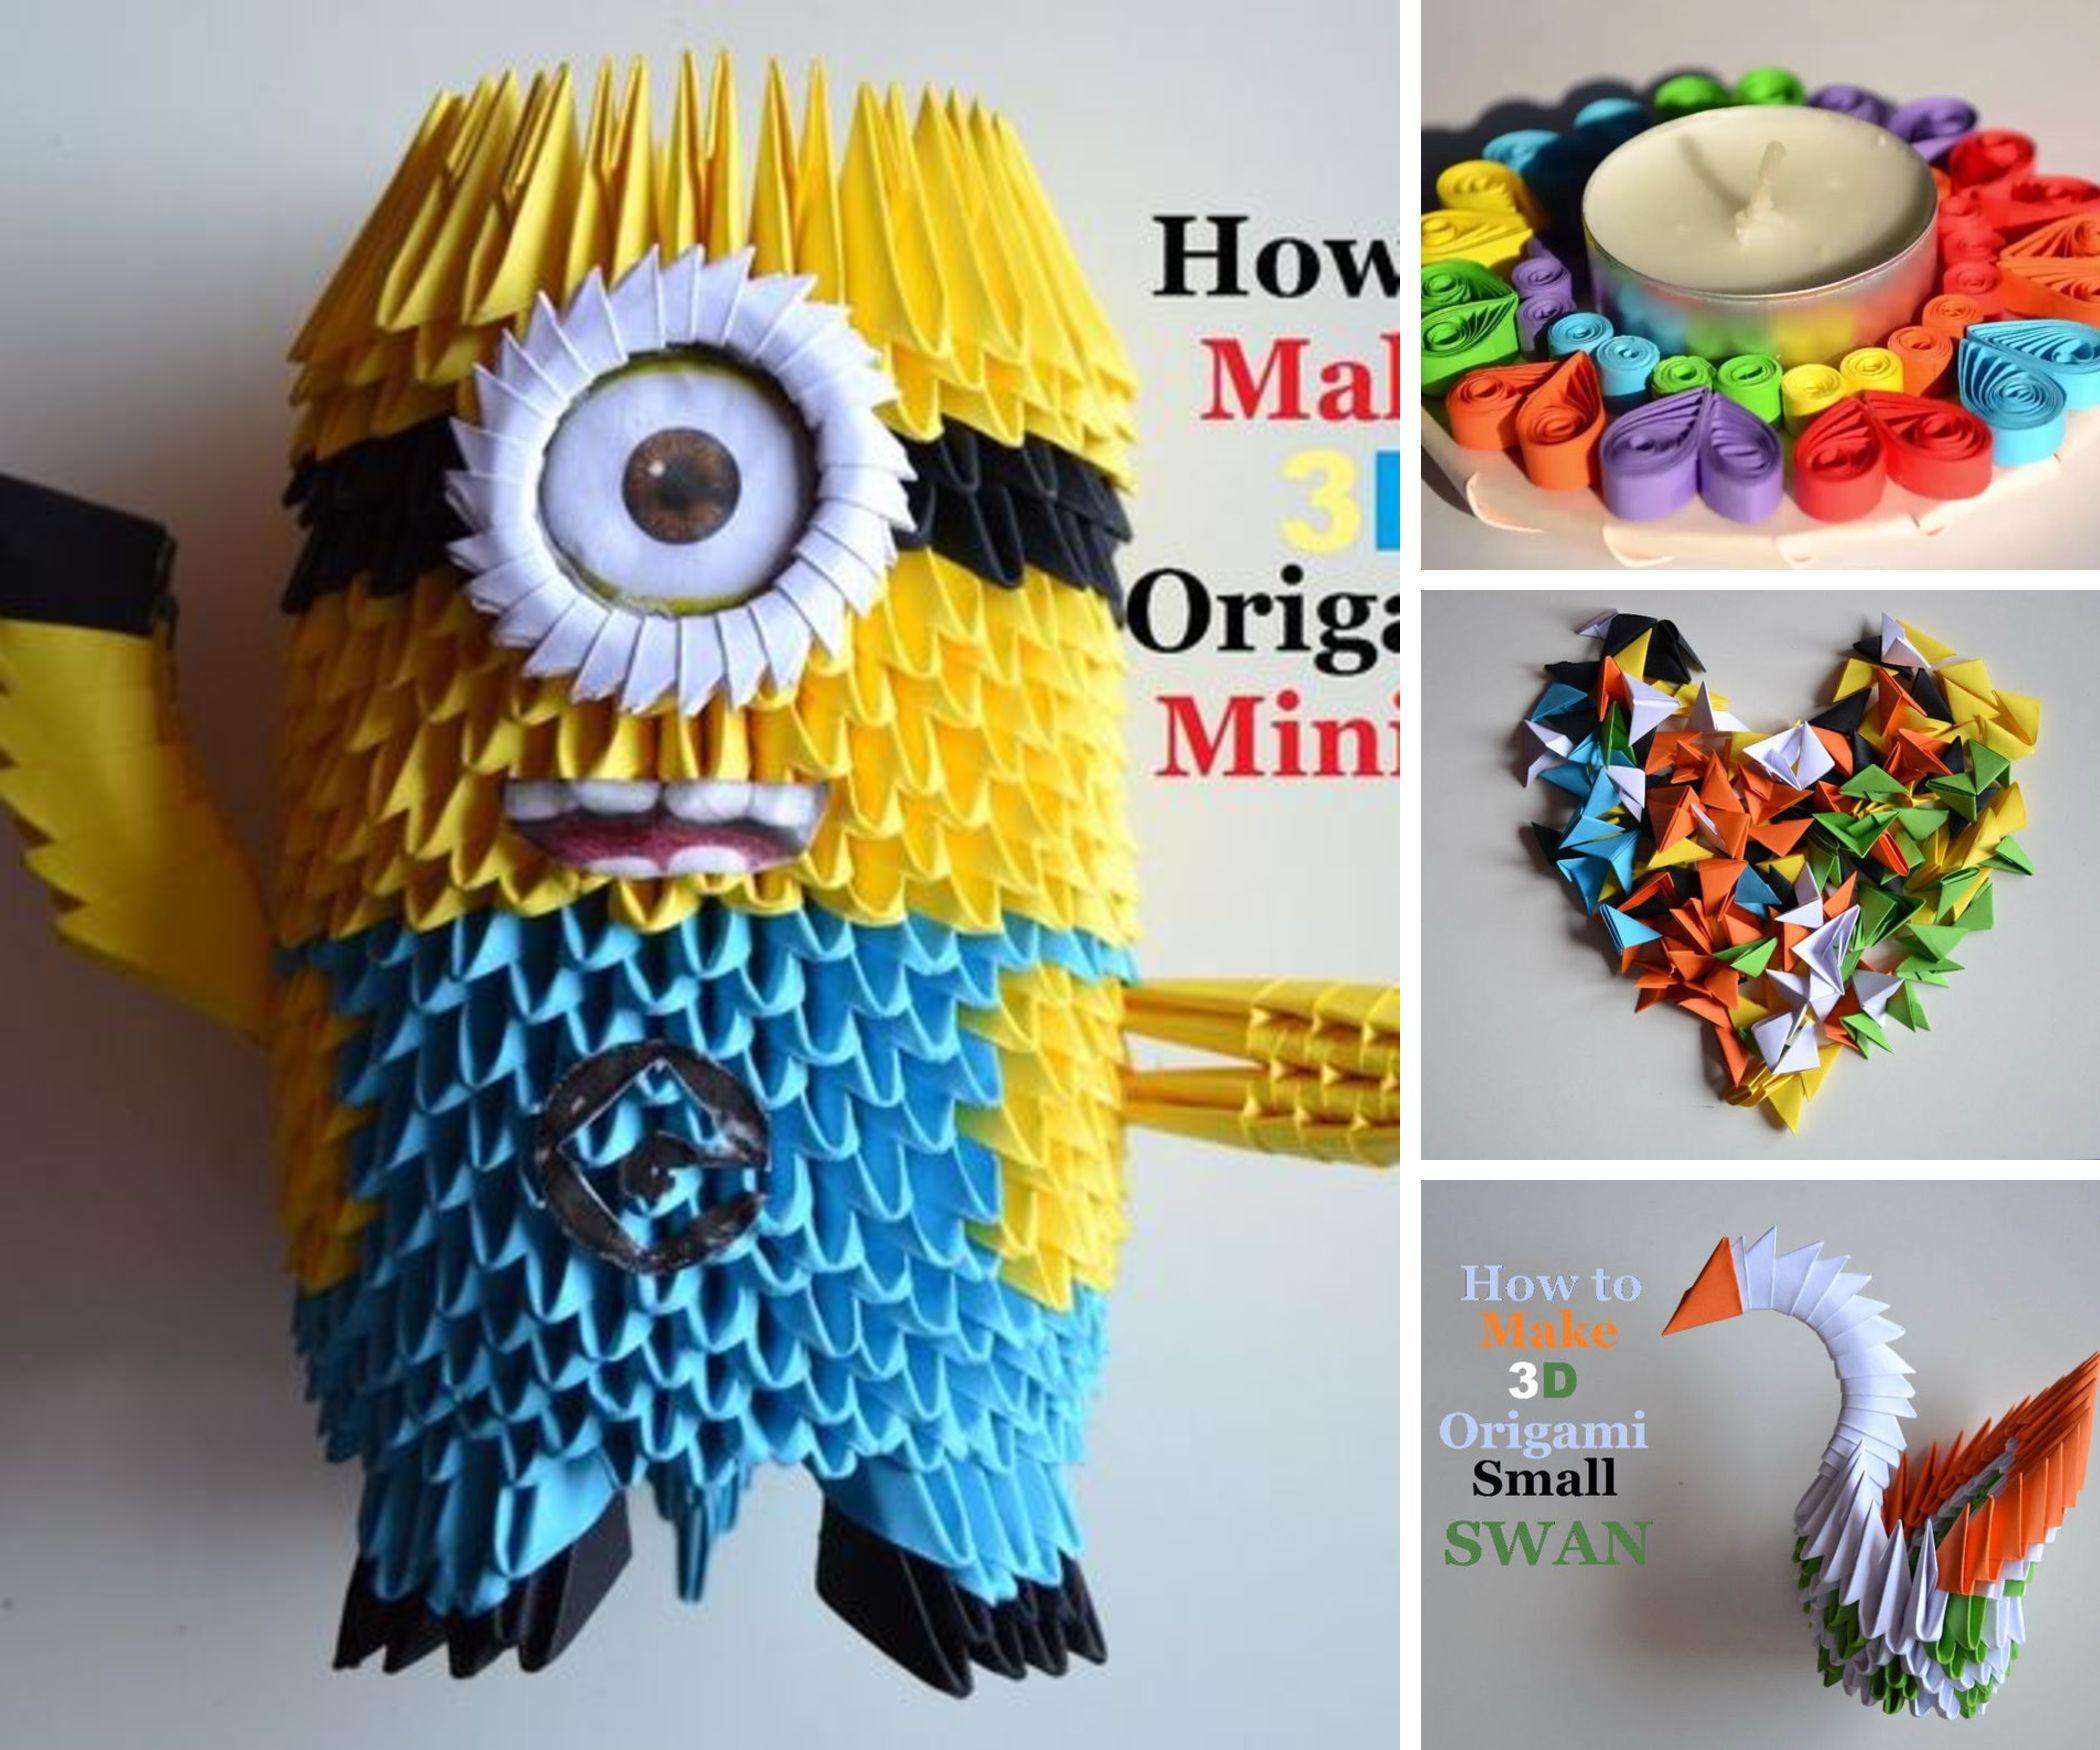 3D Origami Quilling Crafts